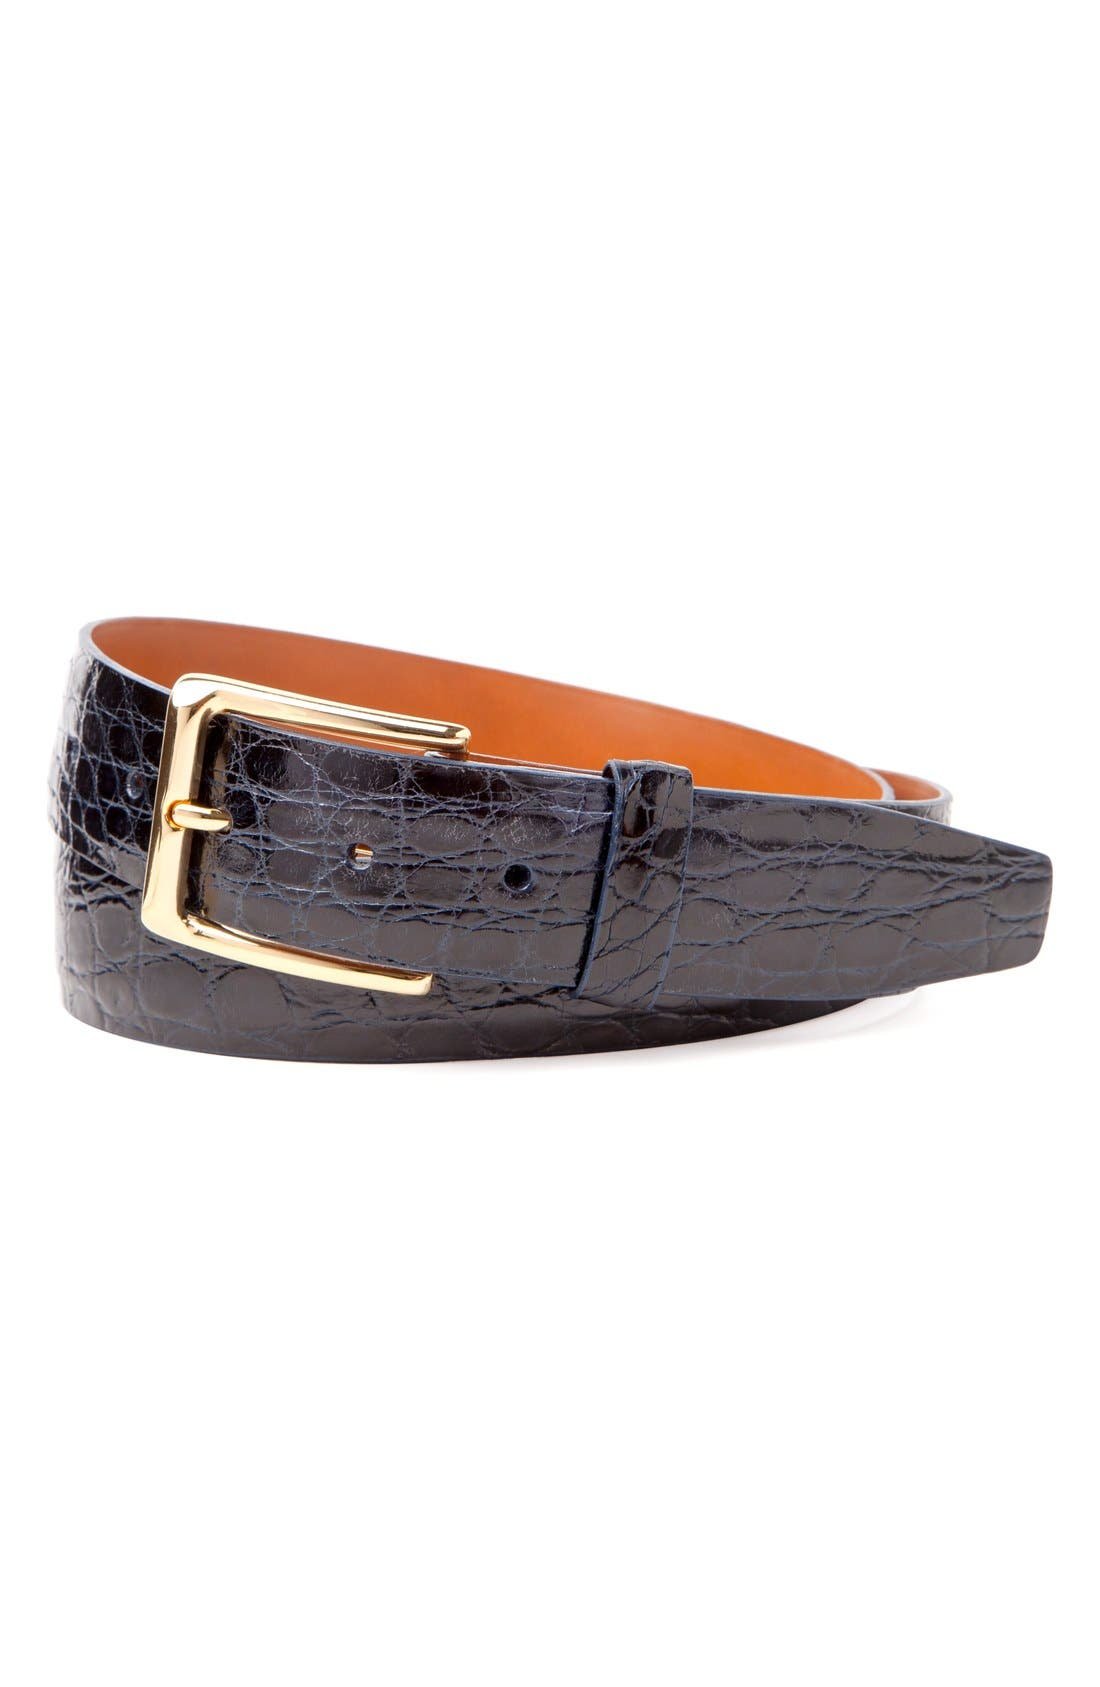 Alternate Image 1 Selected - Trafalgar 'Newington' Genuine Crocodile Leather Belt